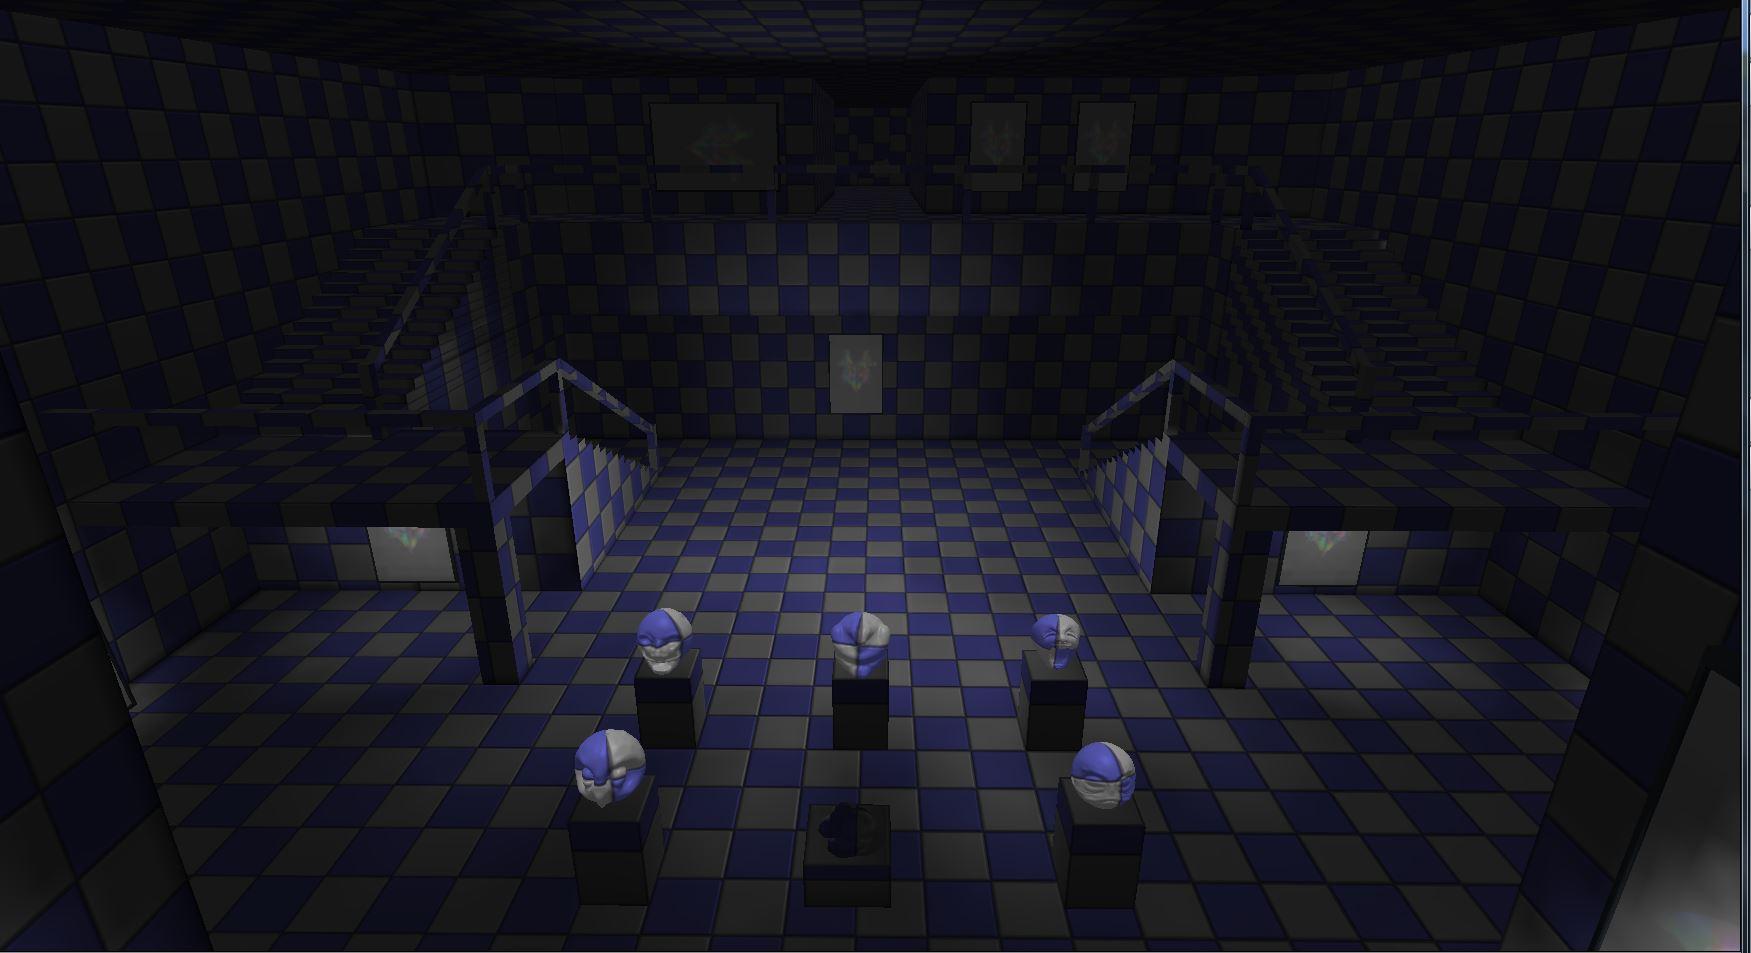 Game jame screenshot 1